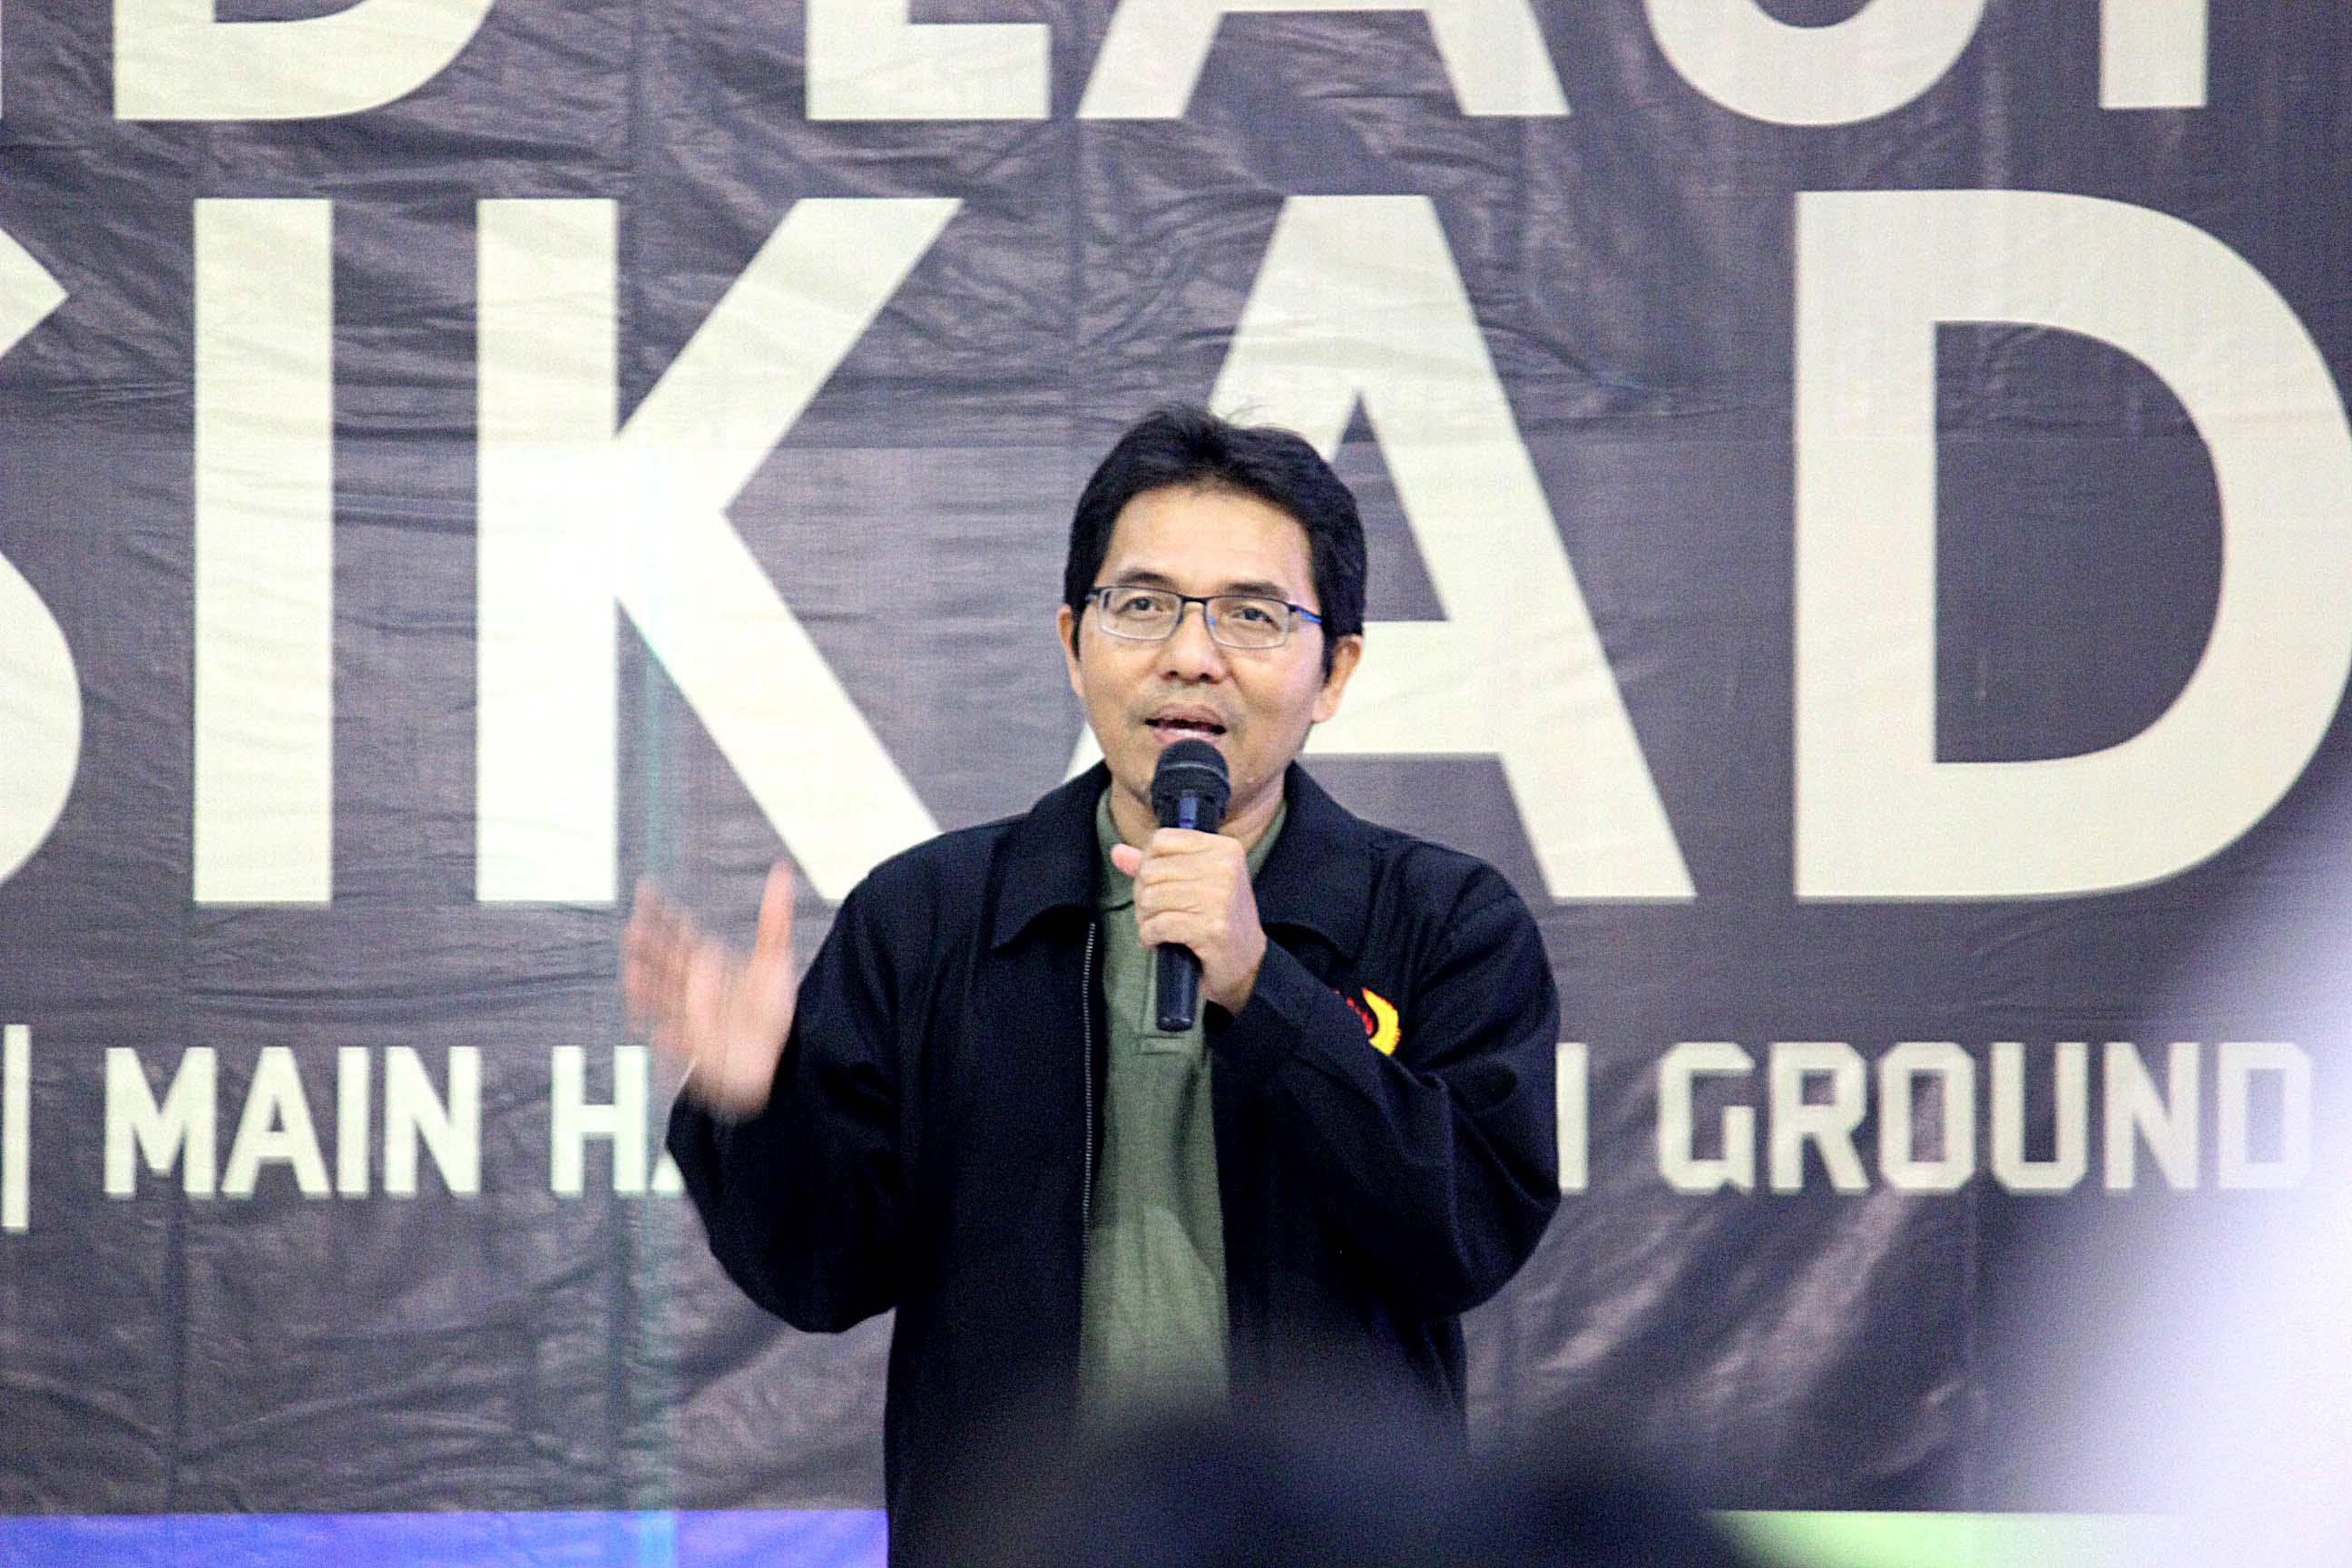 Amri yusra Ketua KONI Kota Depok memberikan sambutan di acara grand launching persikad 1999 di depok town square sabtu (30/03/19)